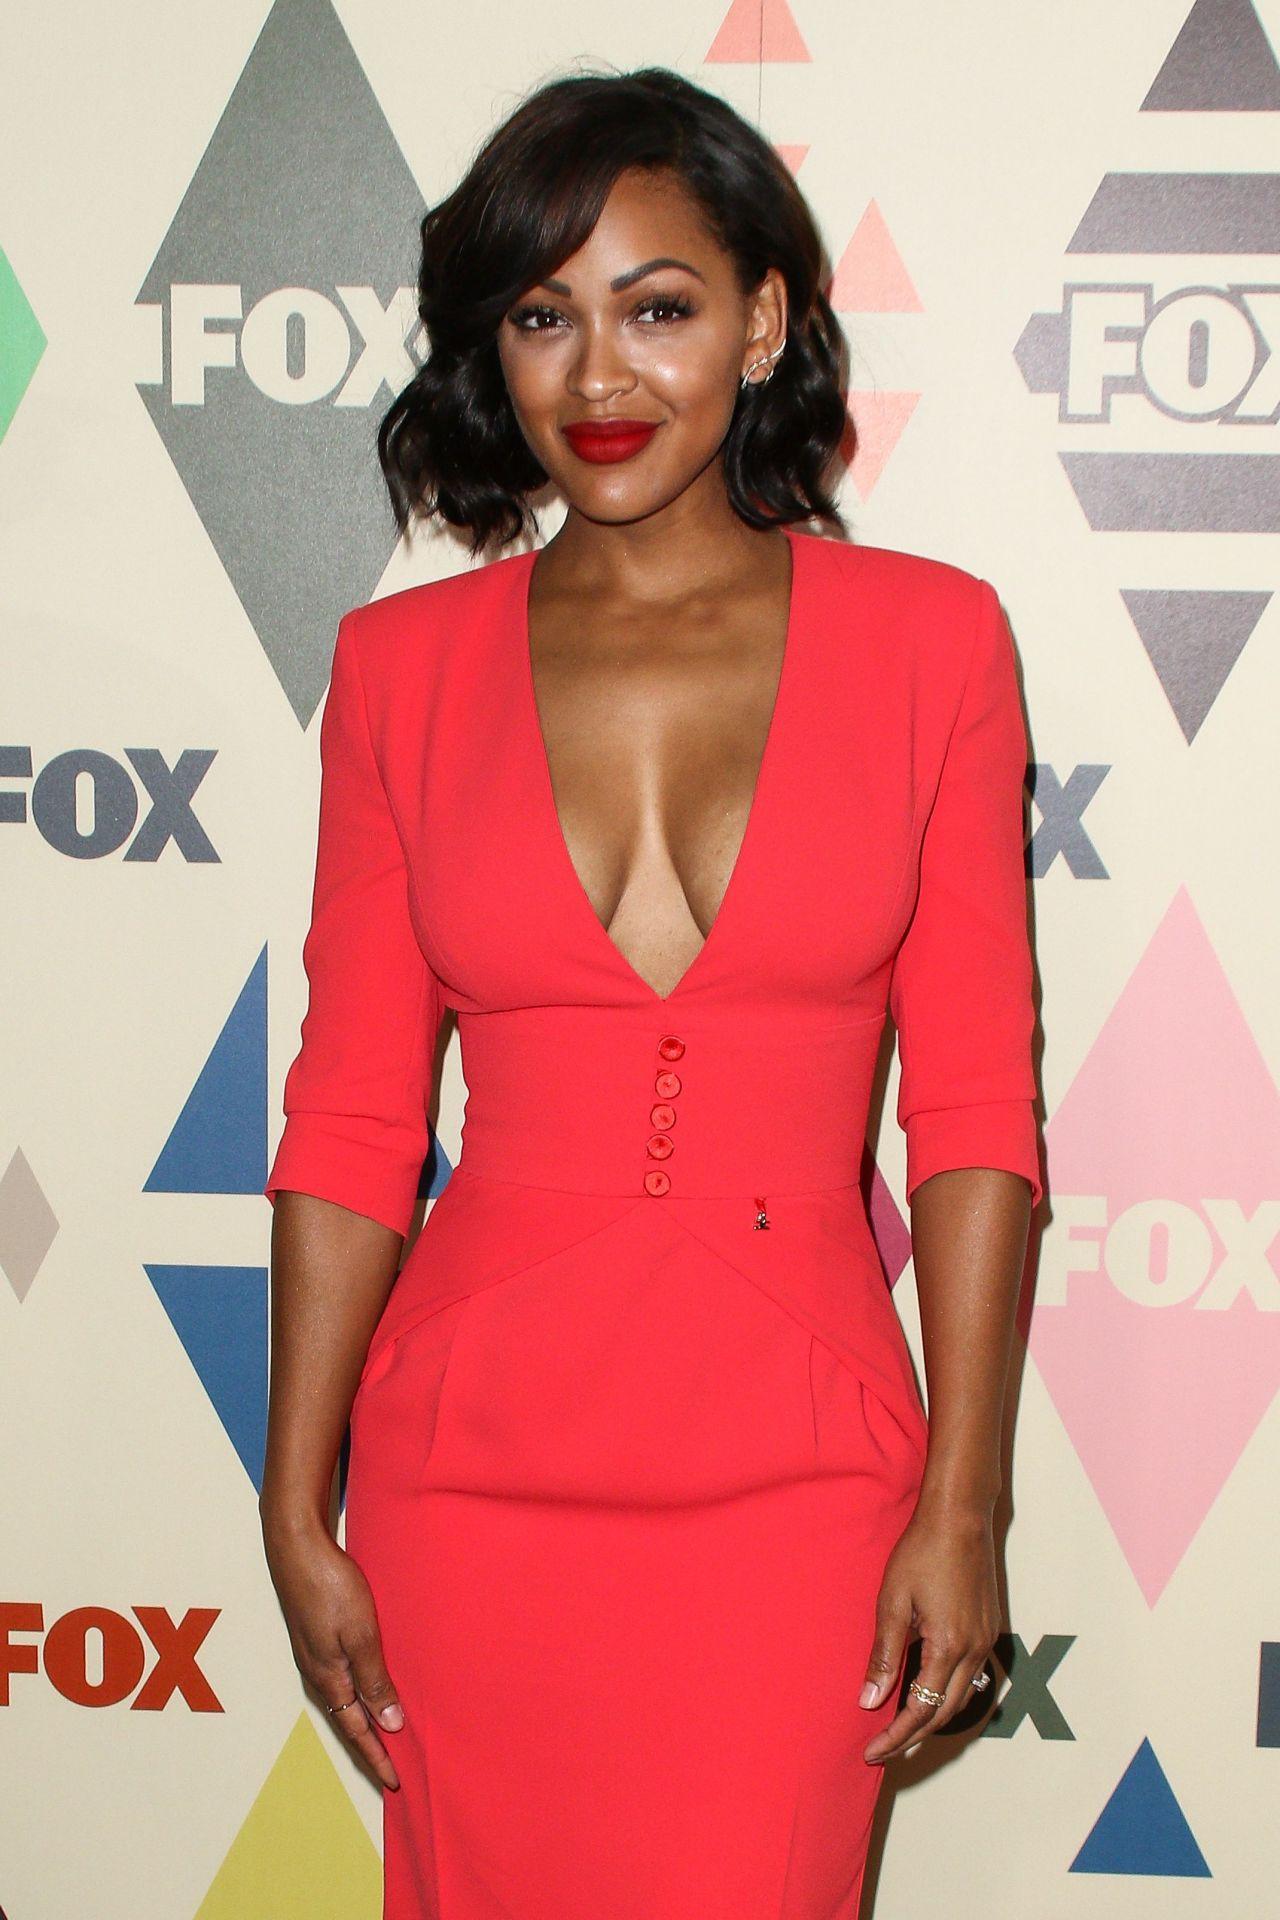 Meagan Good – Fox Summer 2015 TCA Party in West Hollywood